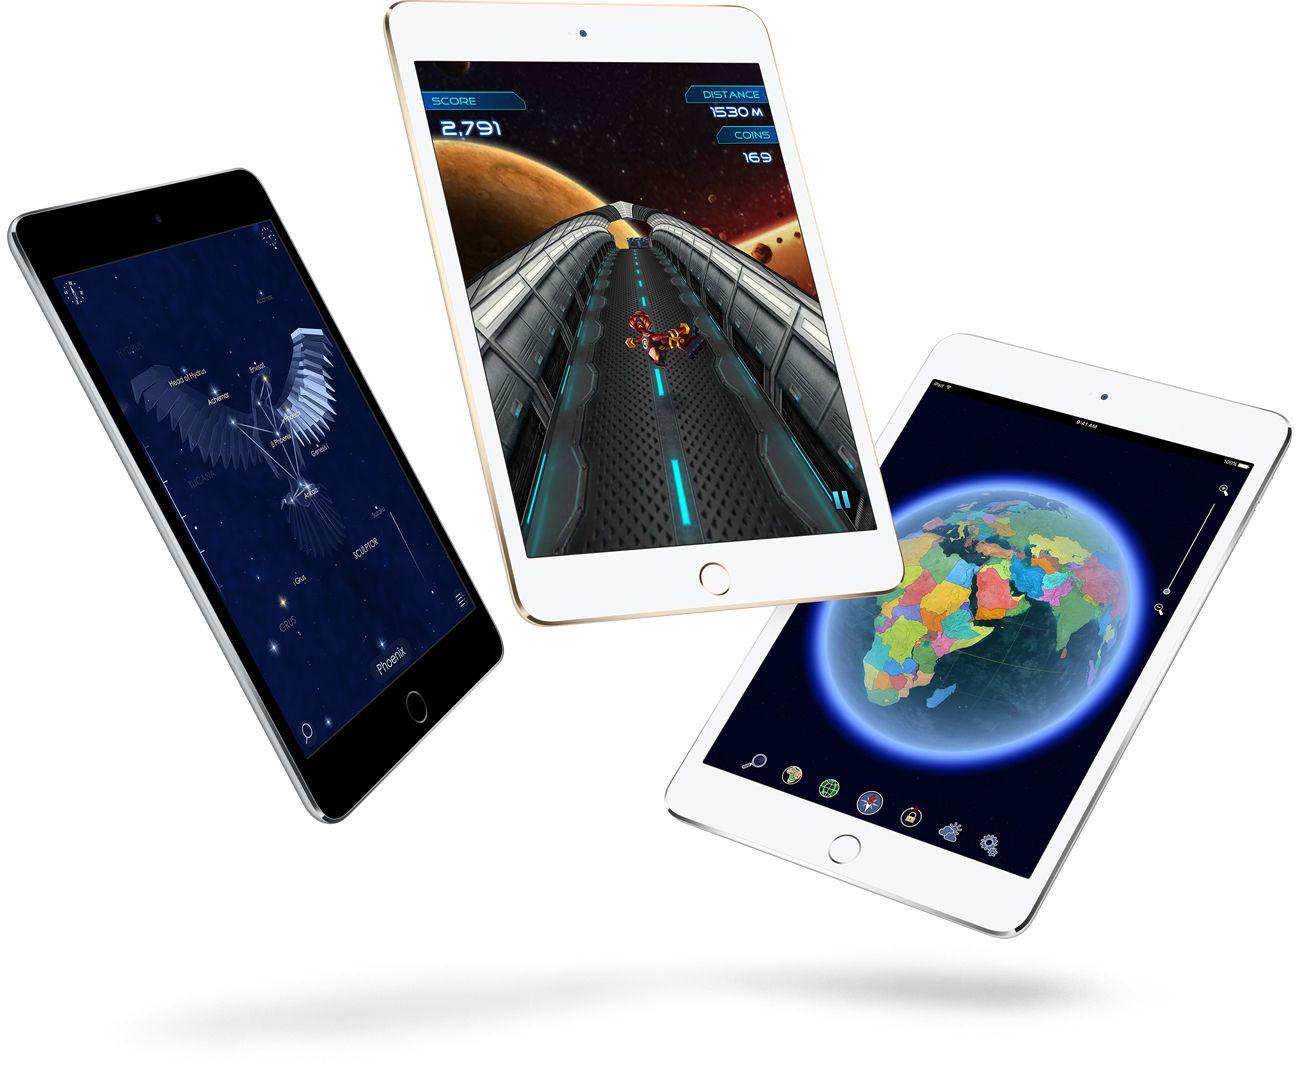 new_web/1445872408398-29761936_7037.jpg